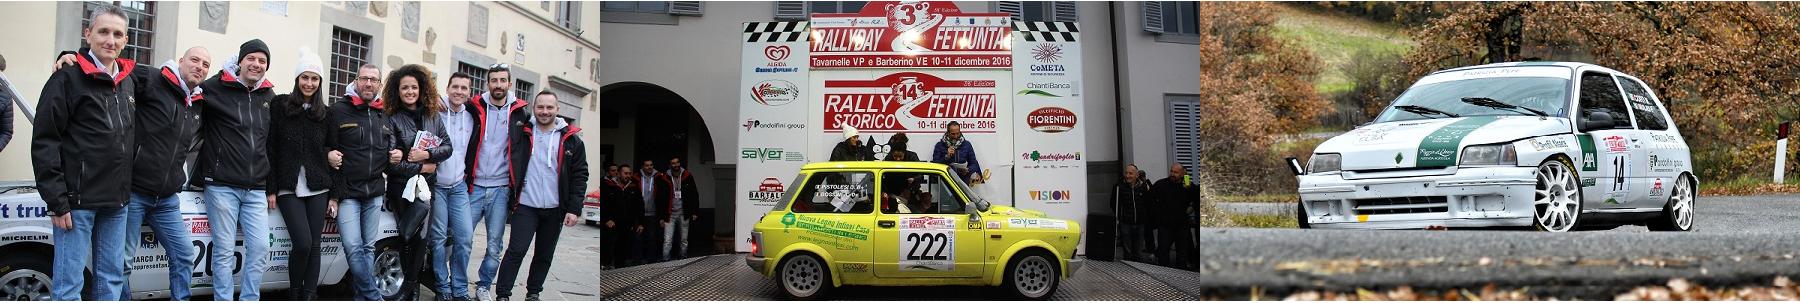 39° Rally della Fettunta